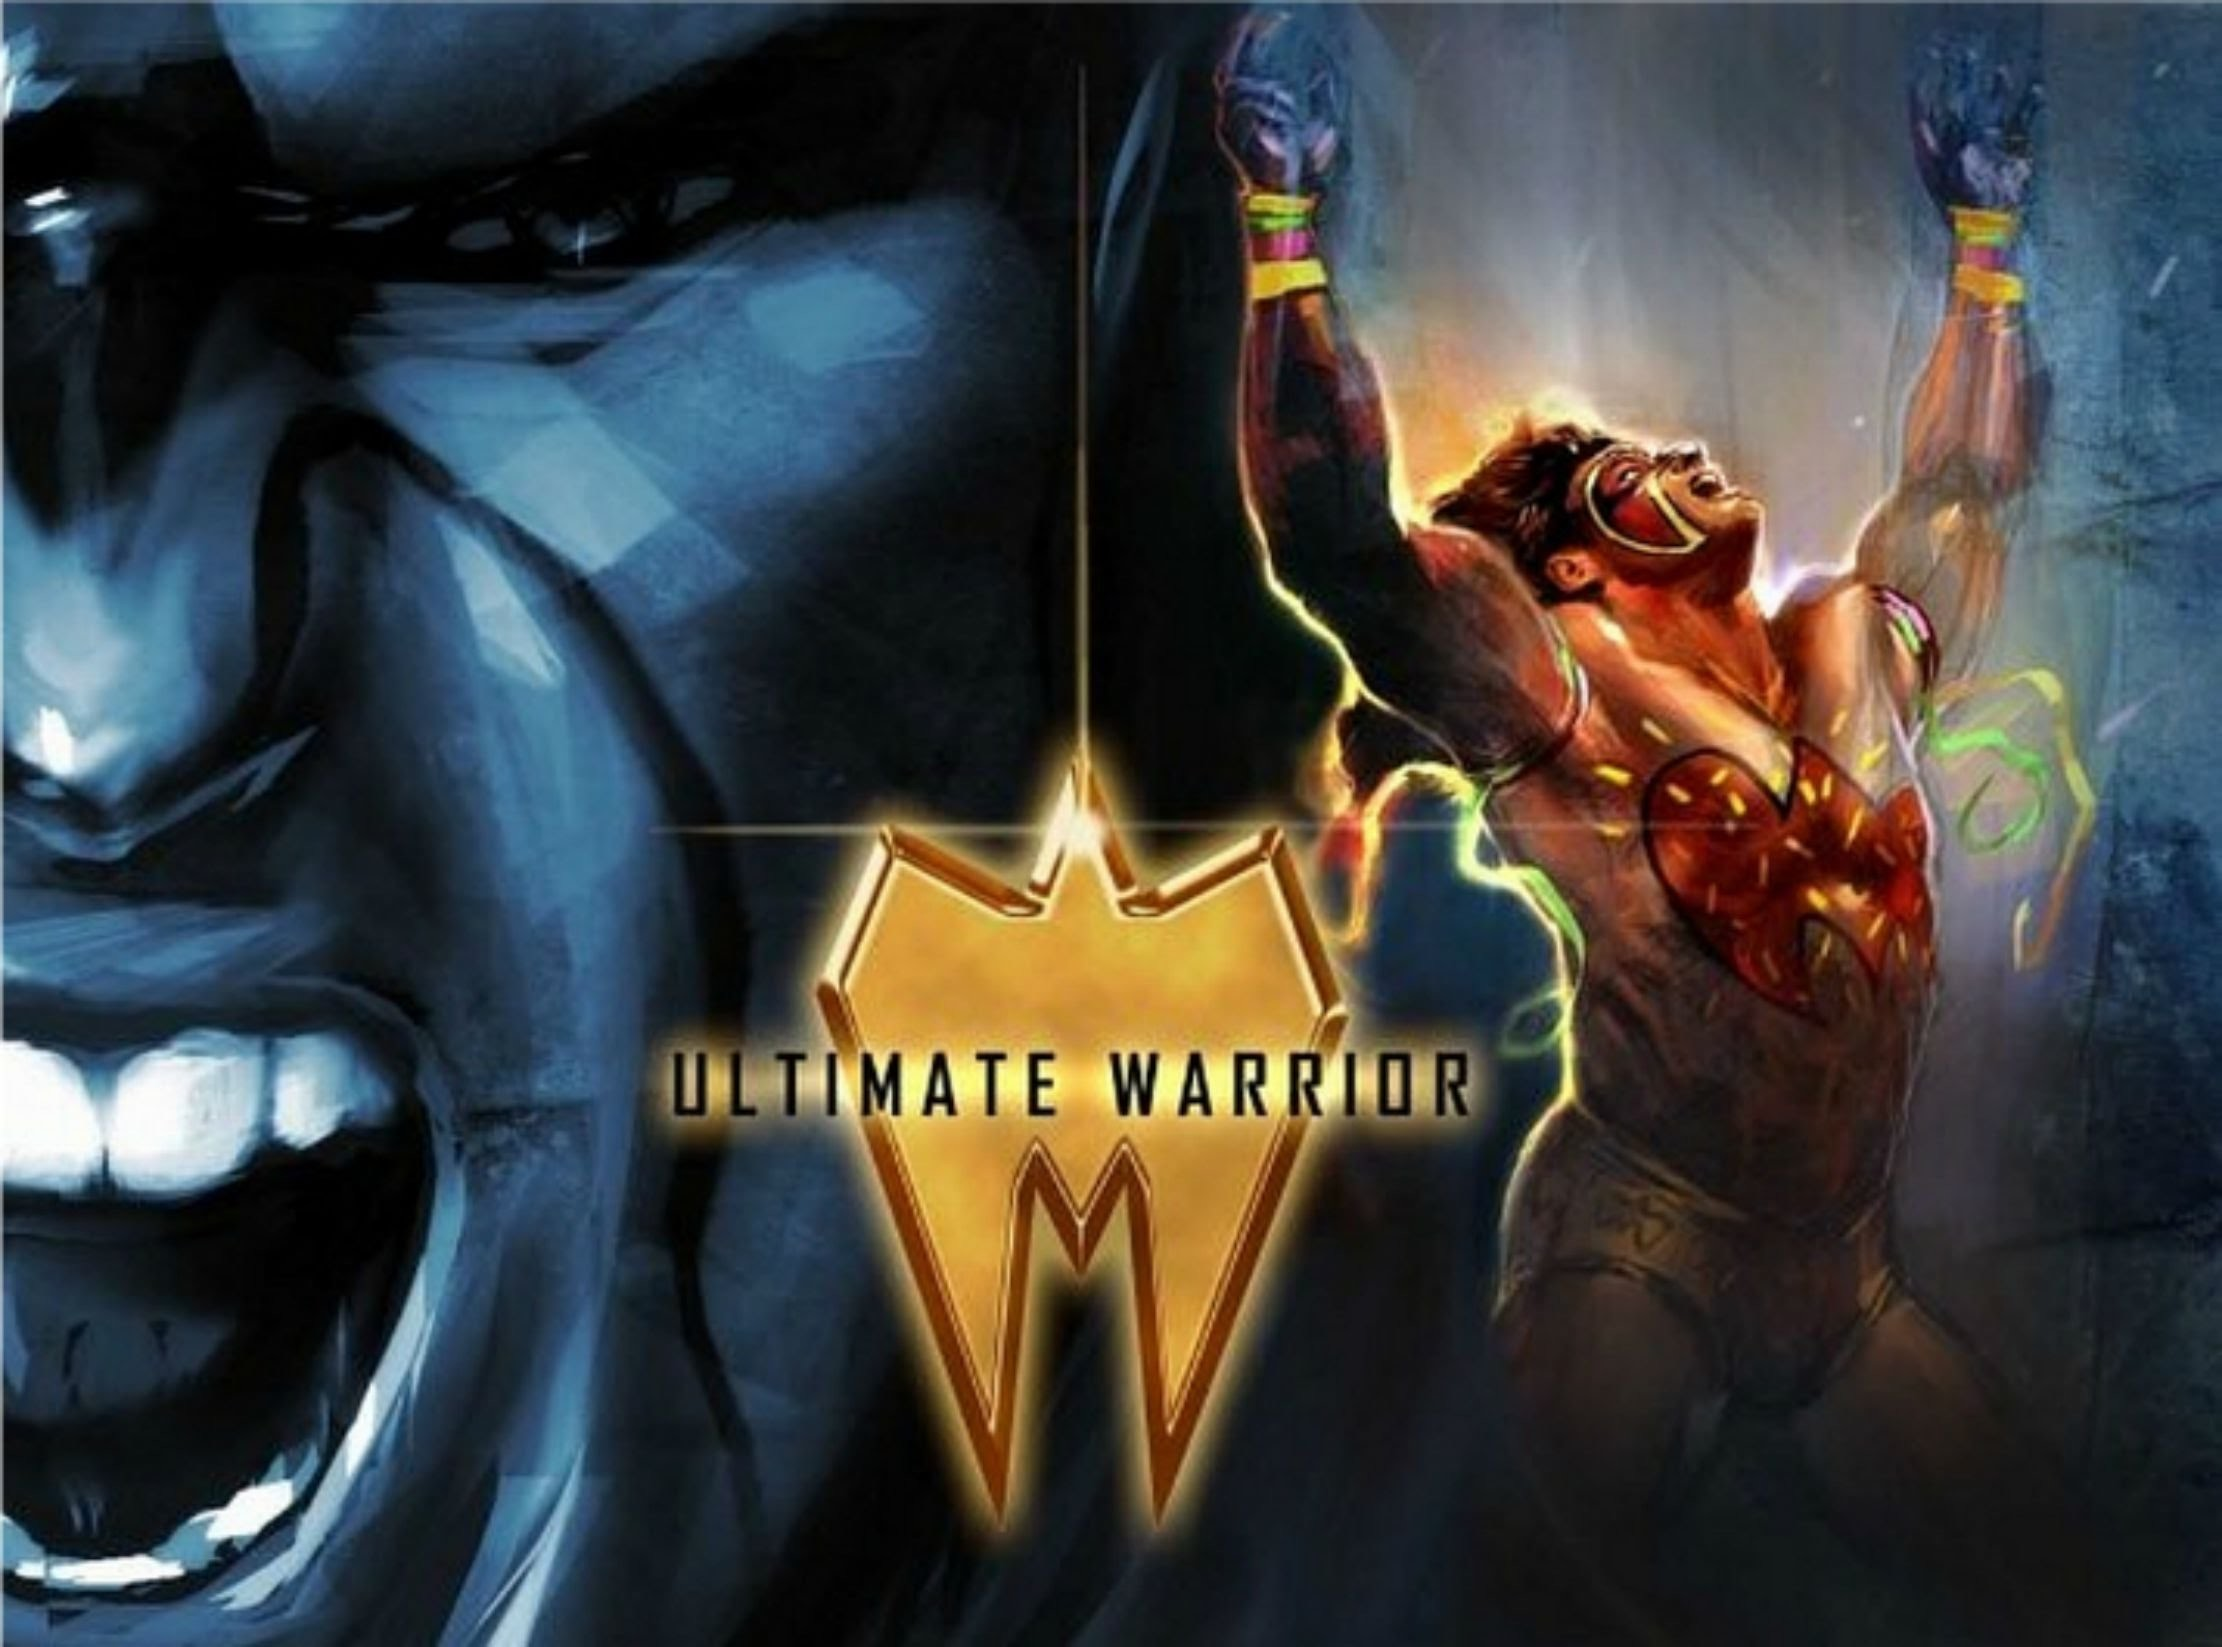 WWE 2K15 [BODY BAG MATCH] ULTIMATE WARRIOR VS THE UNDERTAKER W/ PAUL BEARER  – YouTube